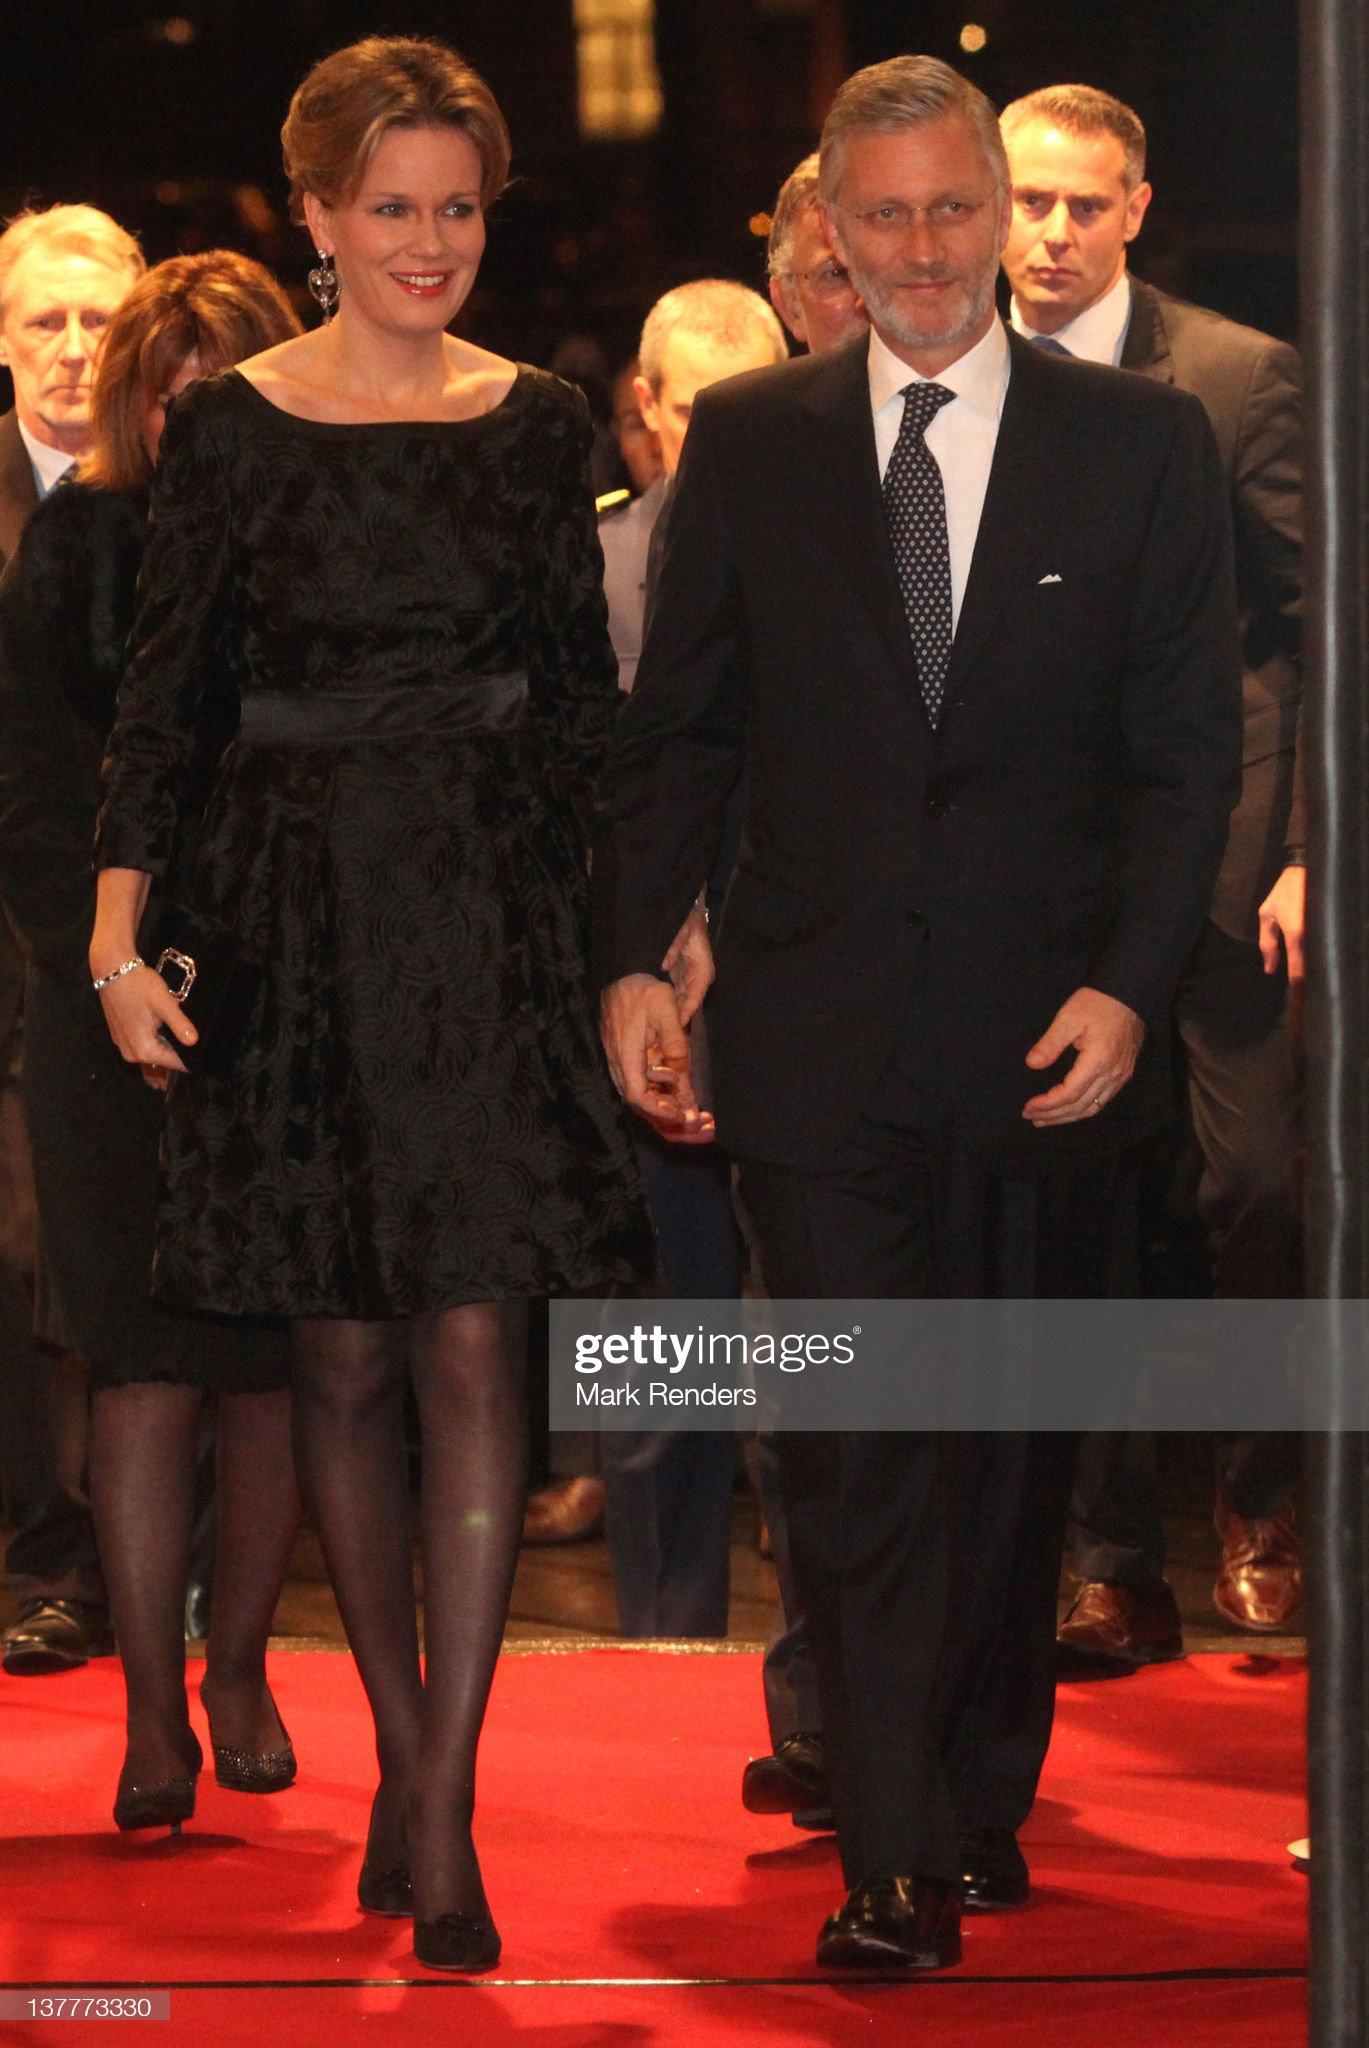 Вечерние наряды Королевы Матильды Crown Prince Frederik Of Denmark And Princess Mary Of Denmark Attend Concert For Danish UE Presidency Celebration : News Photo